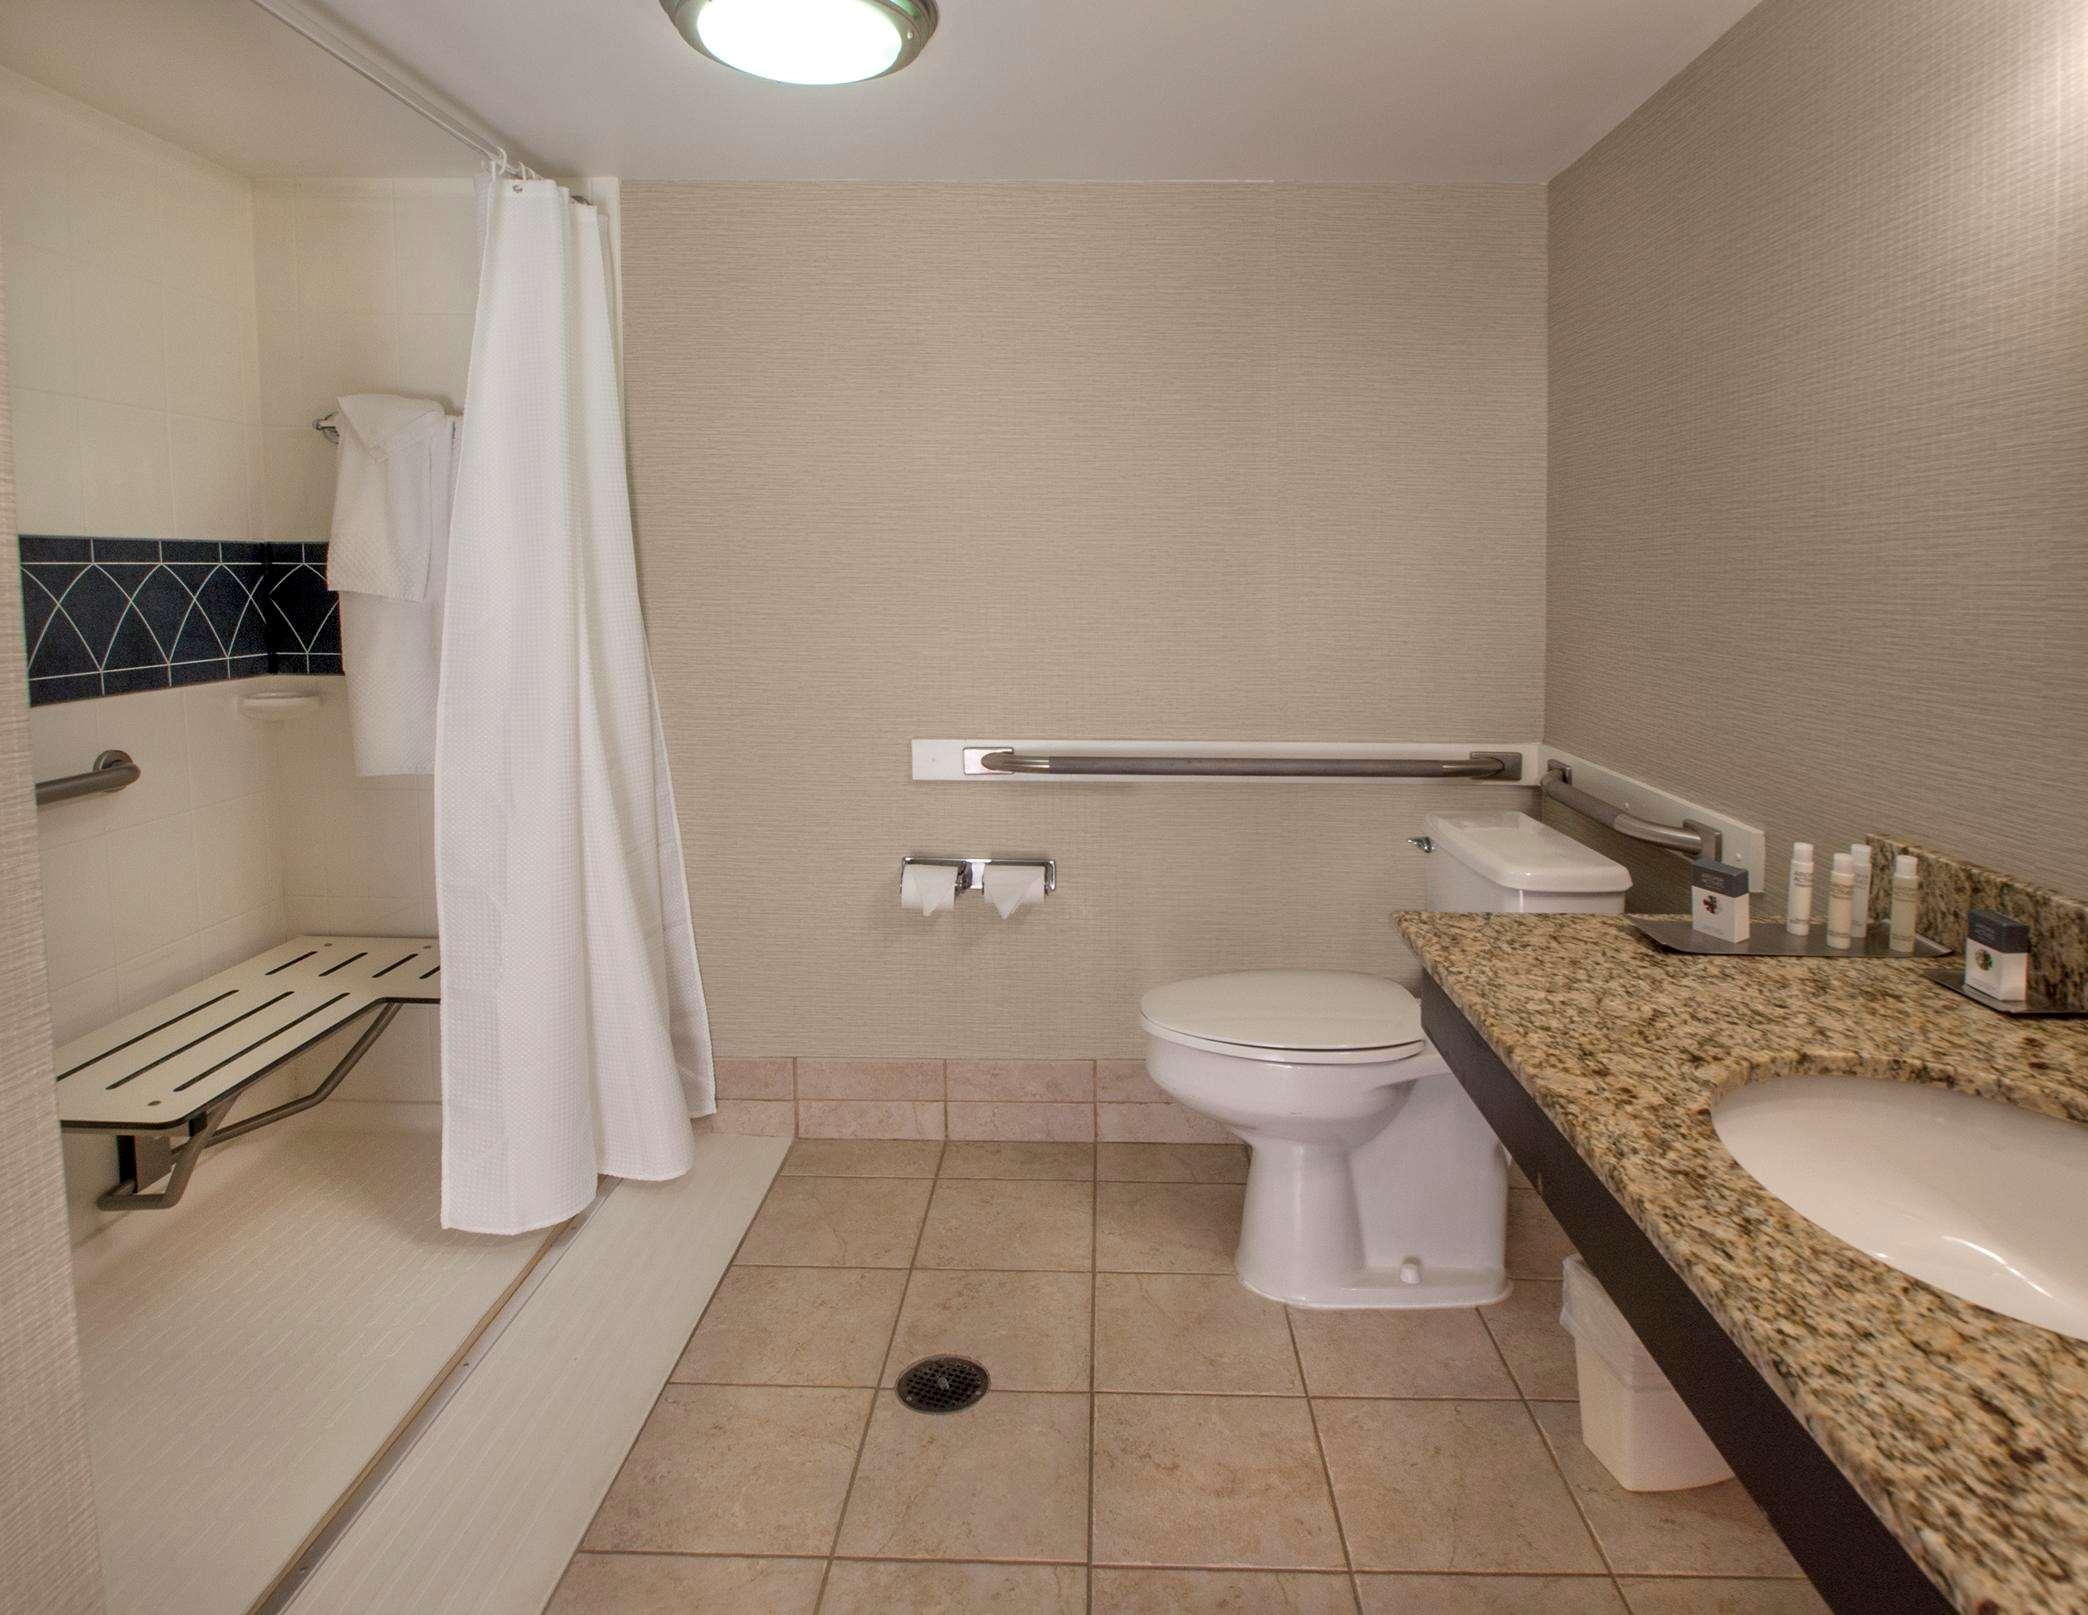 DoubleTree by Hilton Hotel Buffalo - Amherst image 17